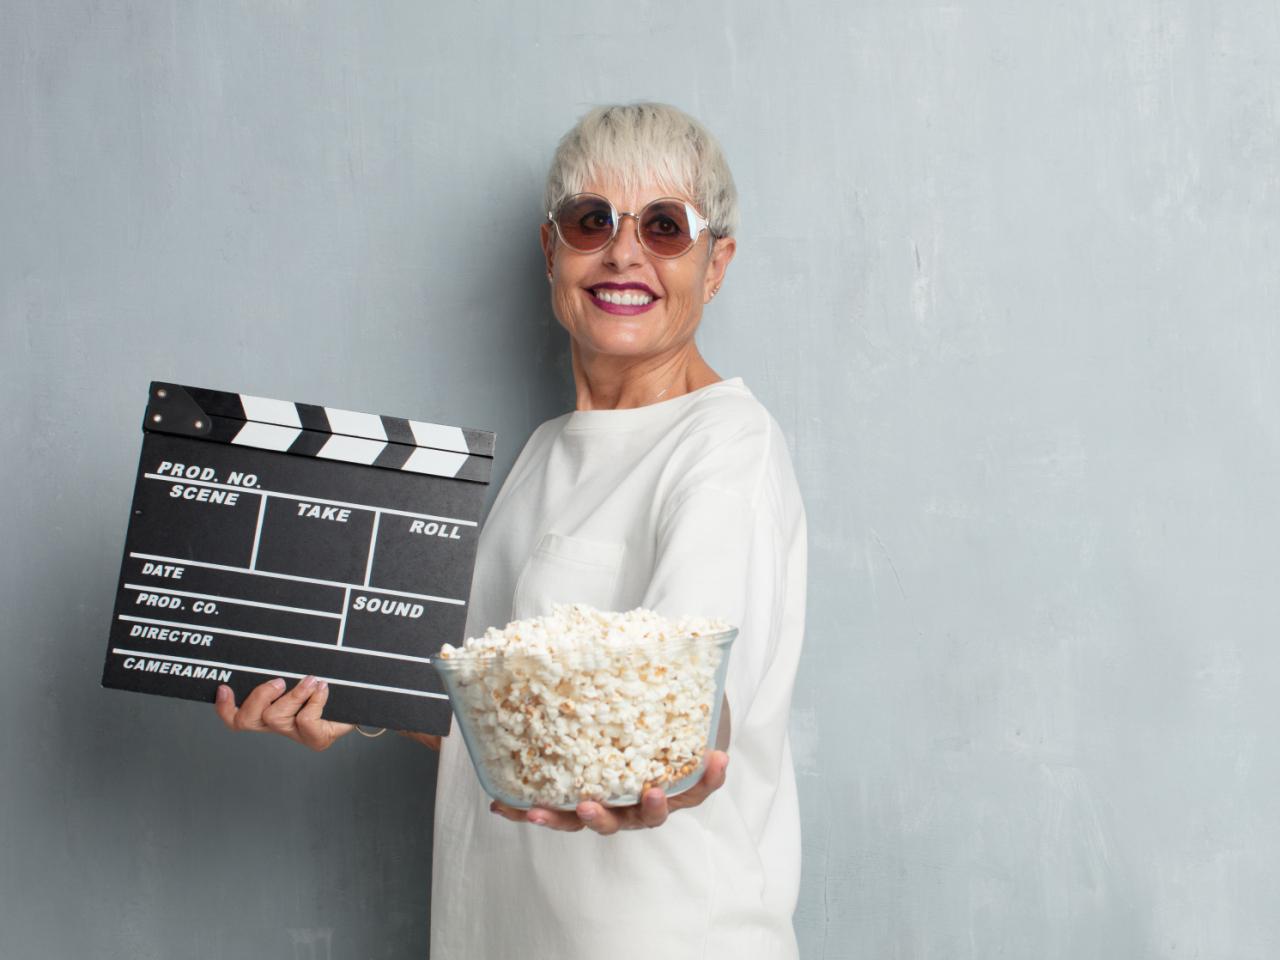 Frau mit Popcorn, bereit fürs Kino